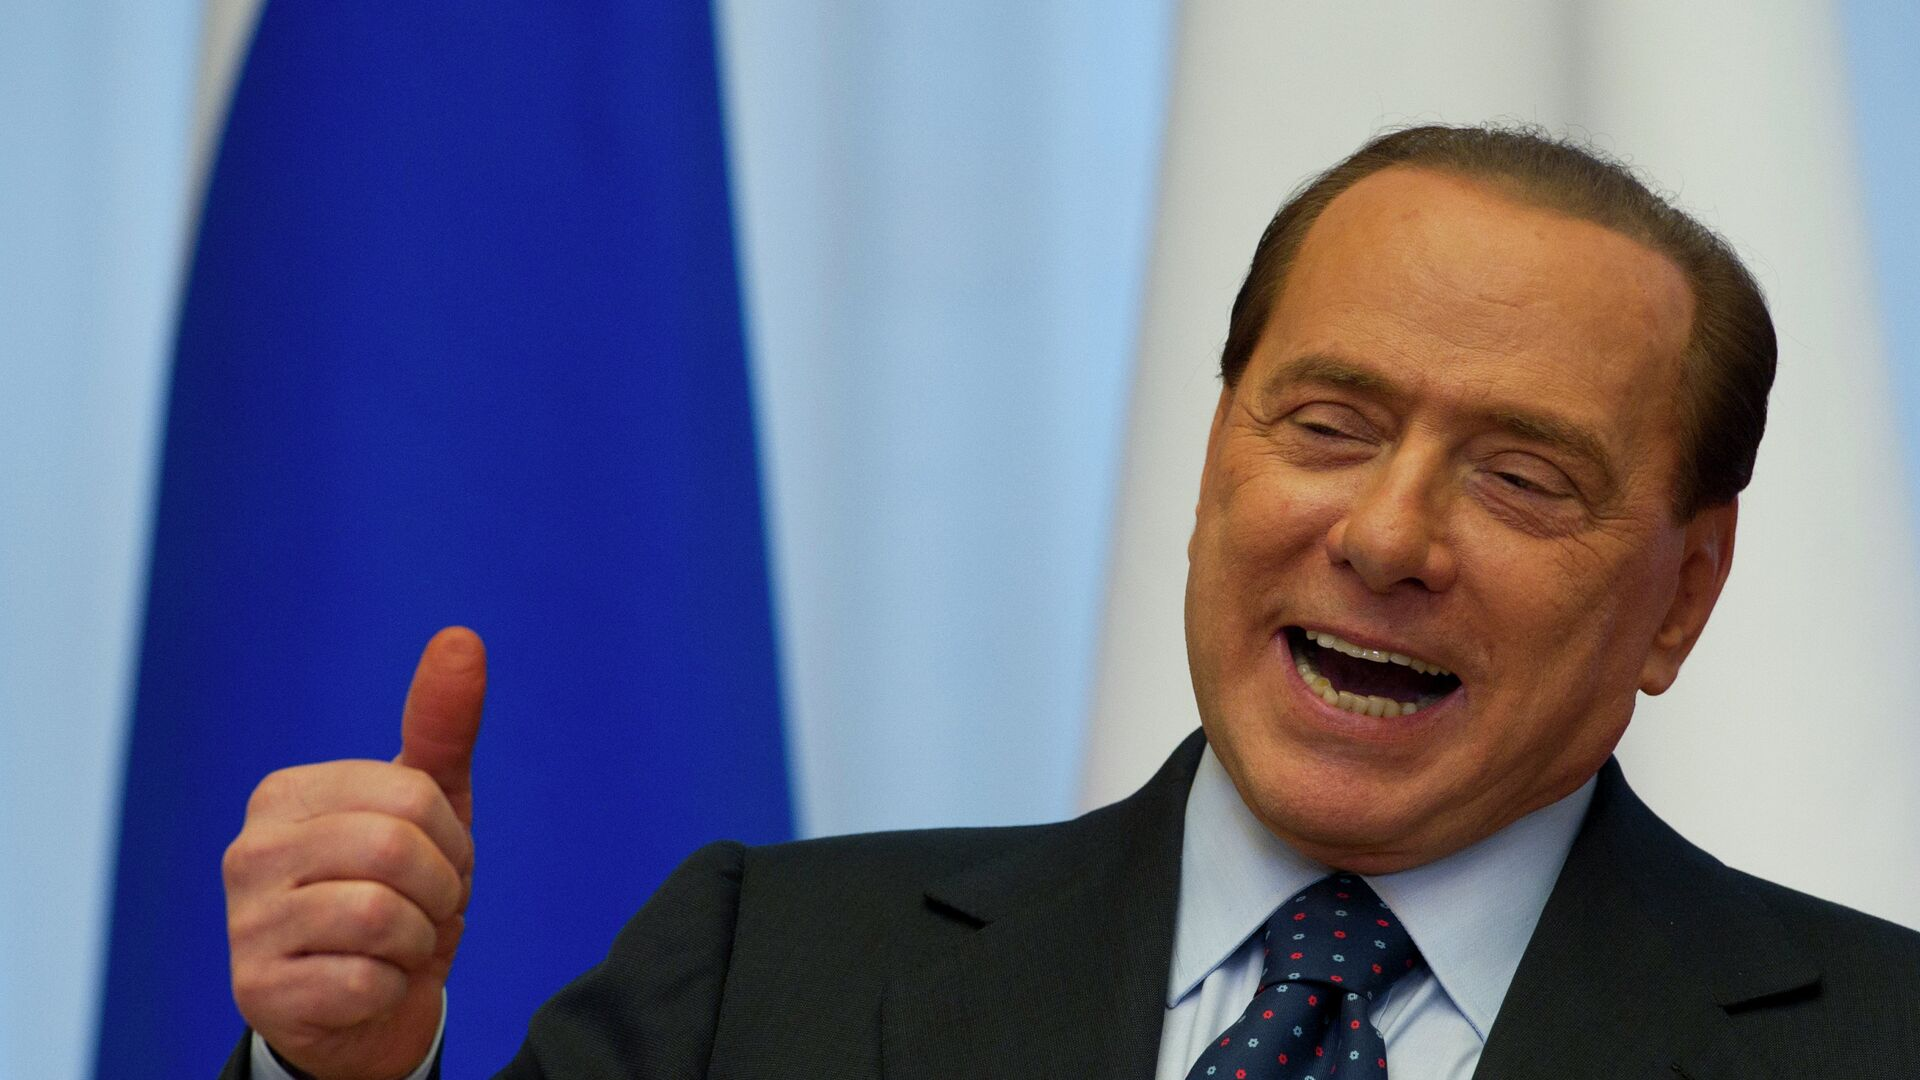 Silvio Berlusconi, ex primer ministro de Italia - Sputnik Mundo, 1920, 29.09.2021